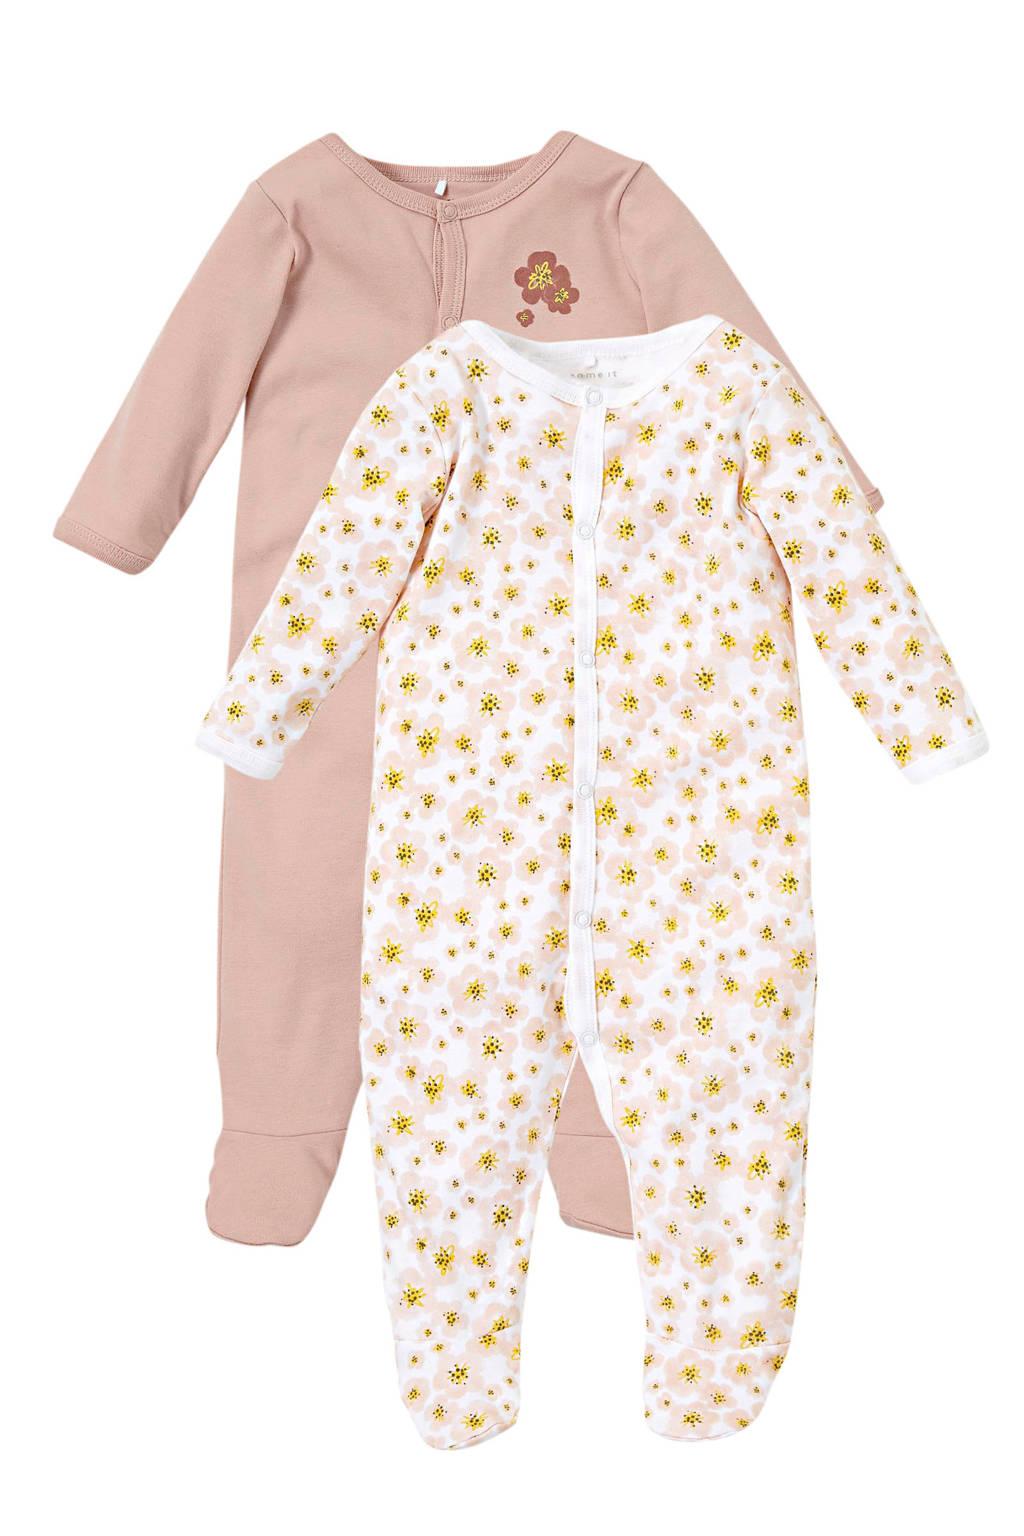 NAME IT BABY baby boxpak - (set van 1), Oudroze/geel/wit